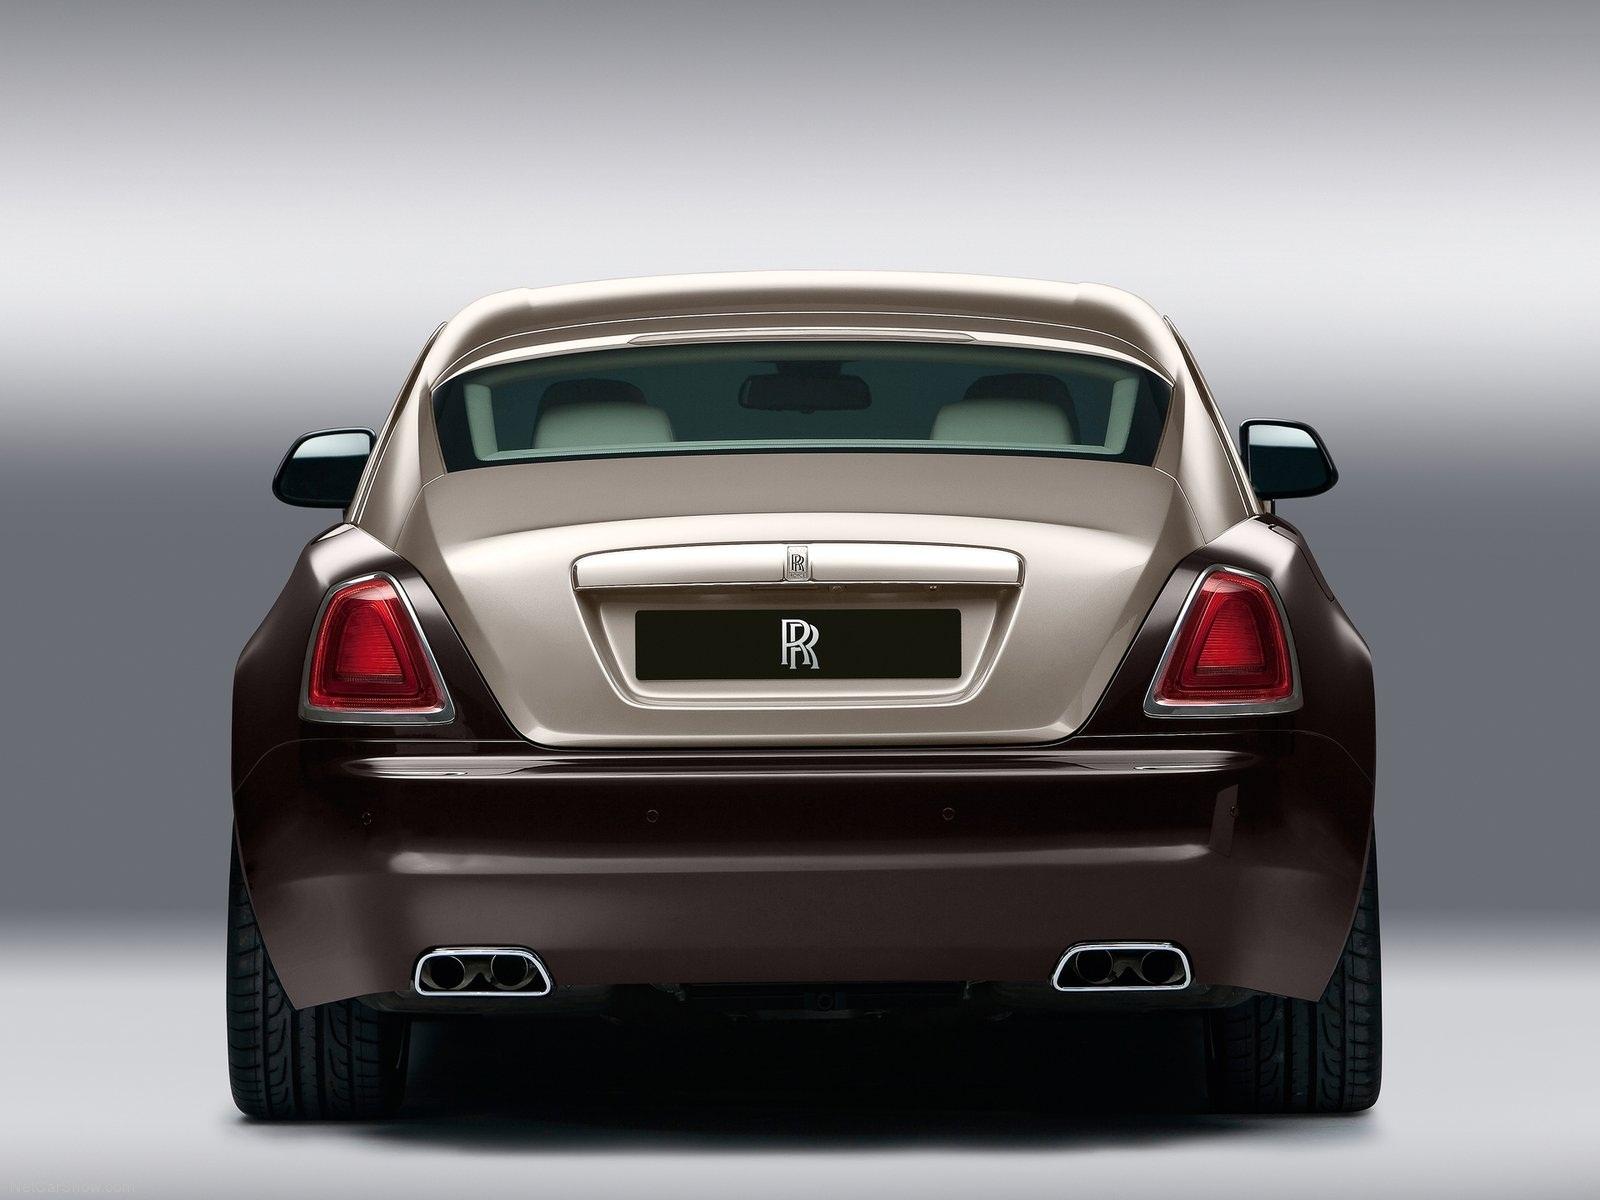 Royce Wraith Price Wraith Rolls Royce Price Check